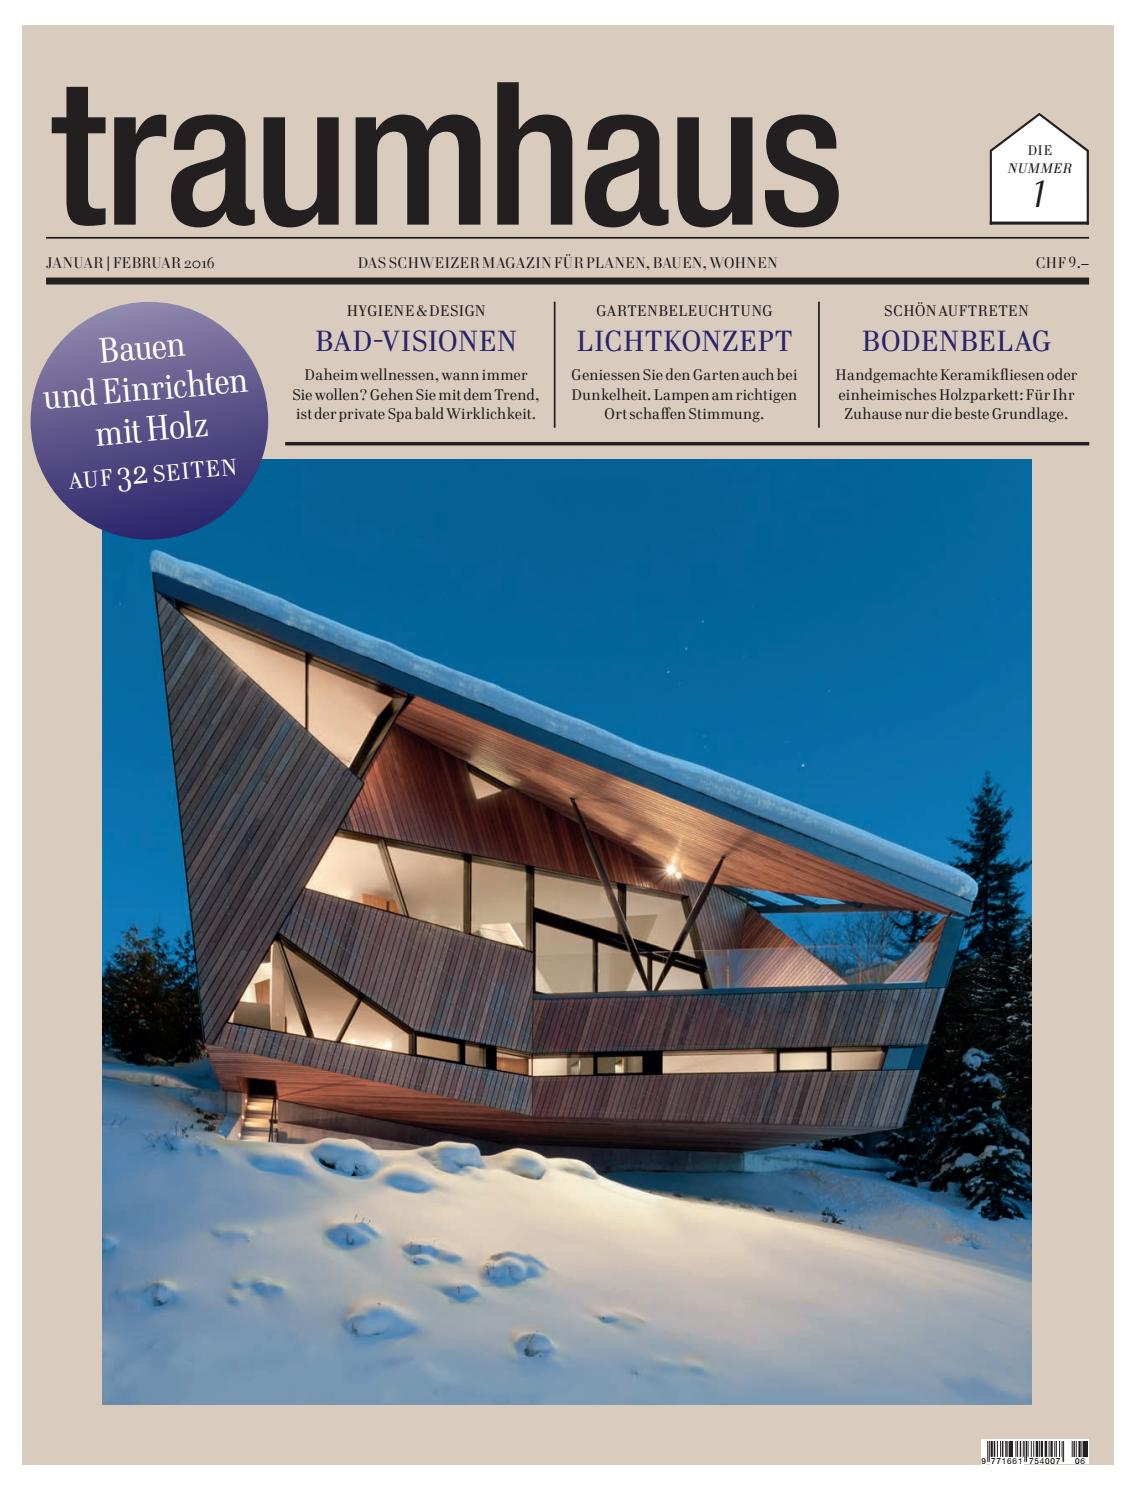 traumhaus 06 2015 by BL Verlag AG - issuu